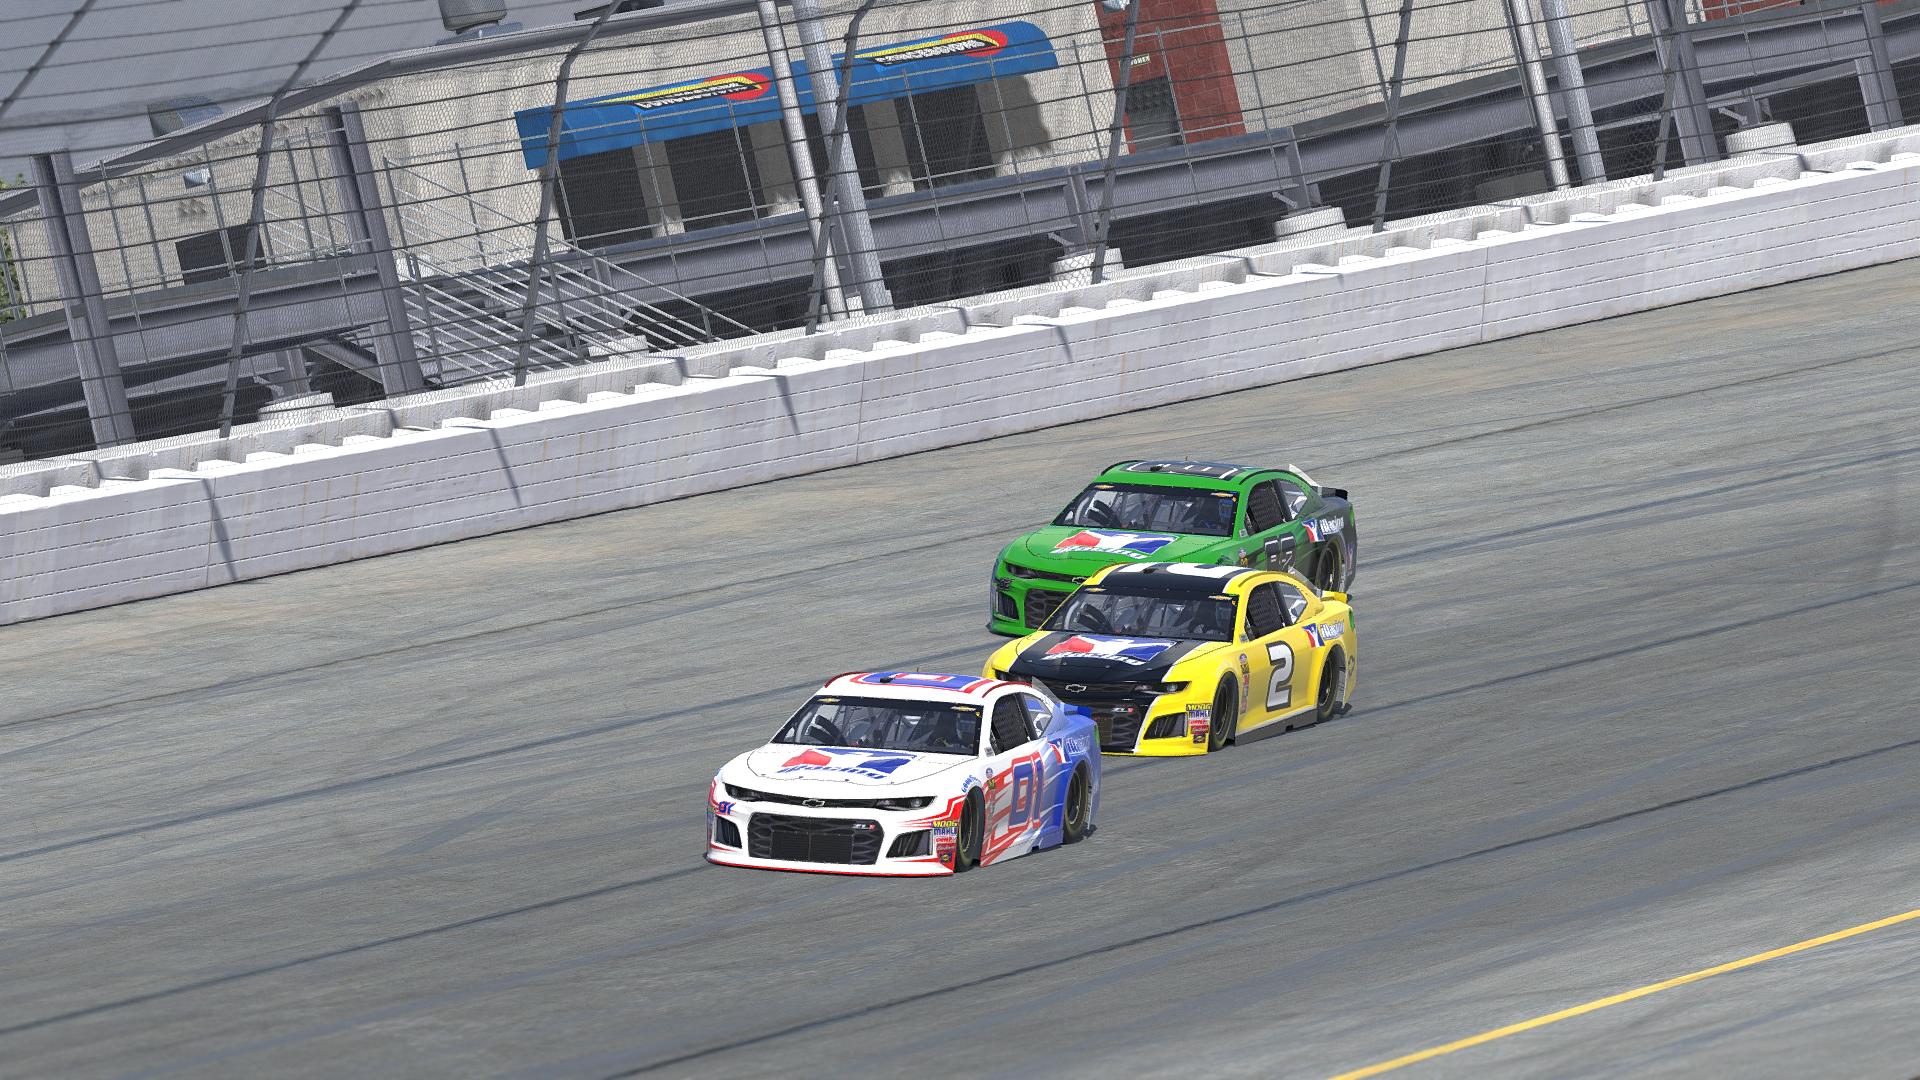 Nascar 2008 Screenshots Pictures Wallpapers: IRacing.com Motorsport Simulations